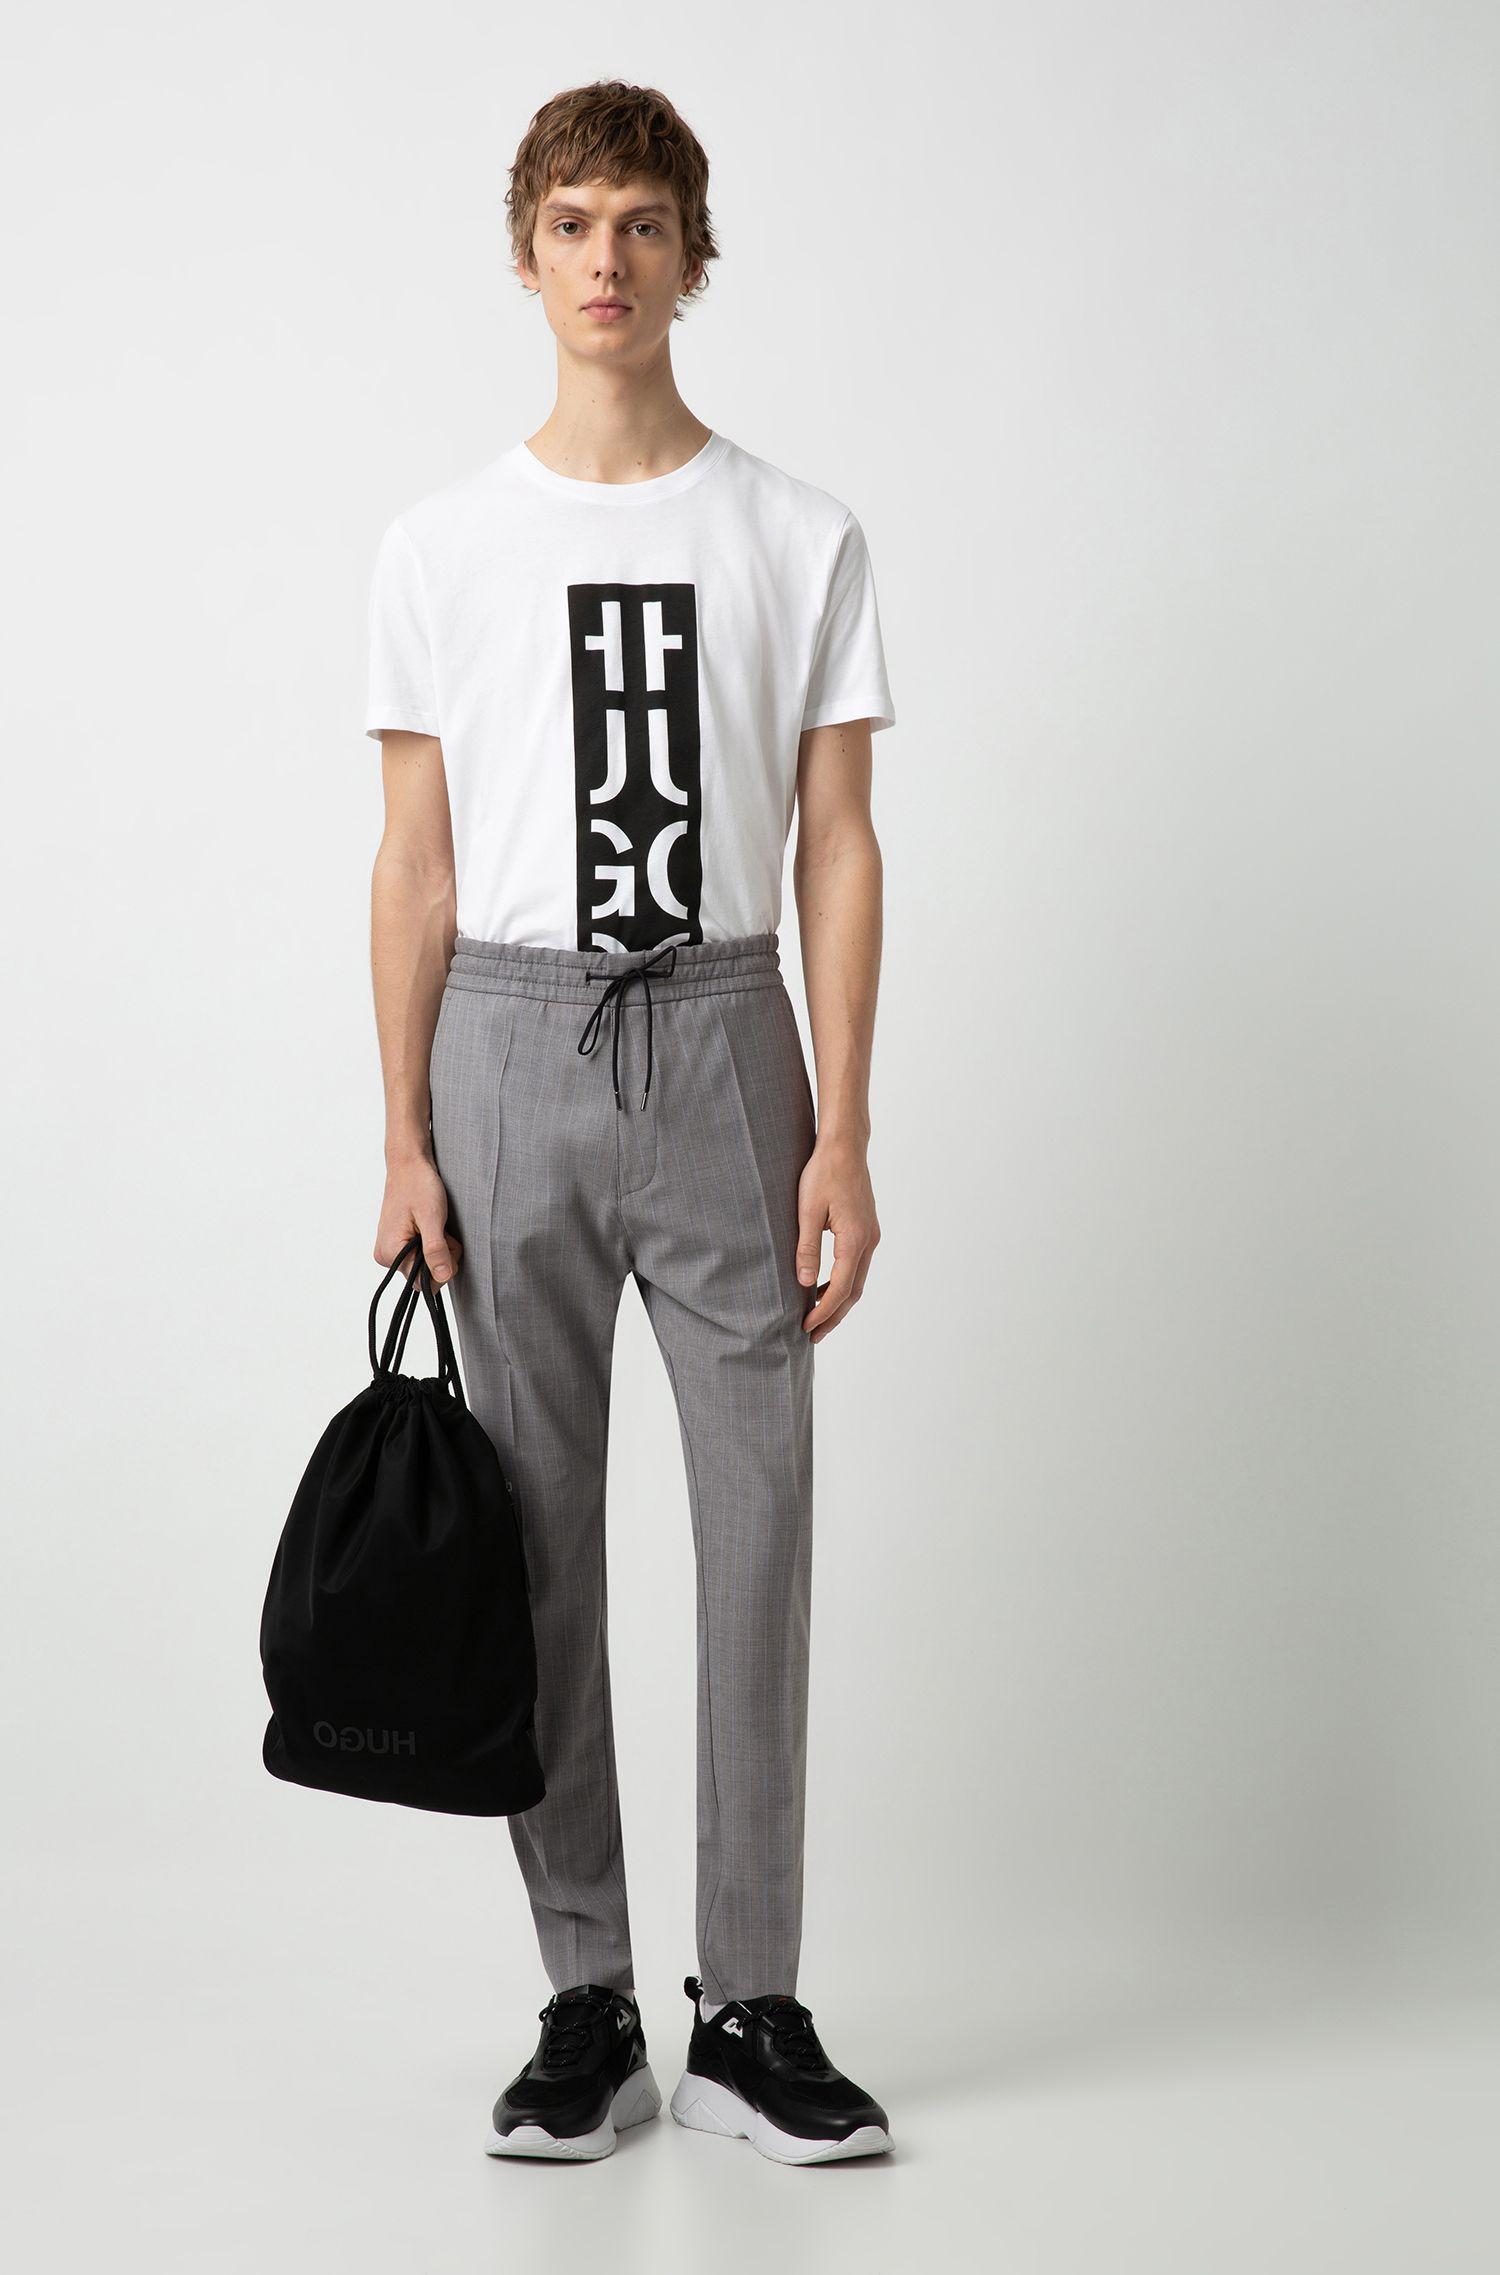 Hugo Boss - Mochila de cordones en tejido de gabardina de nylon con logo invertido - 2